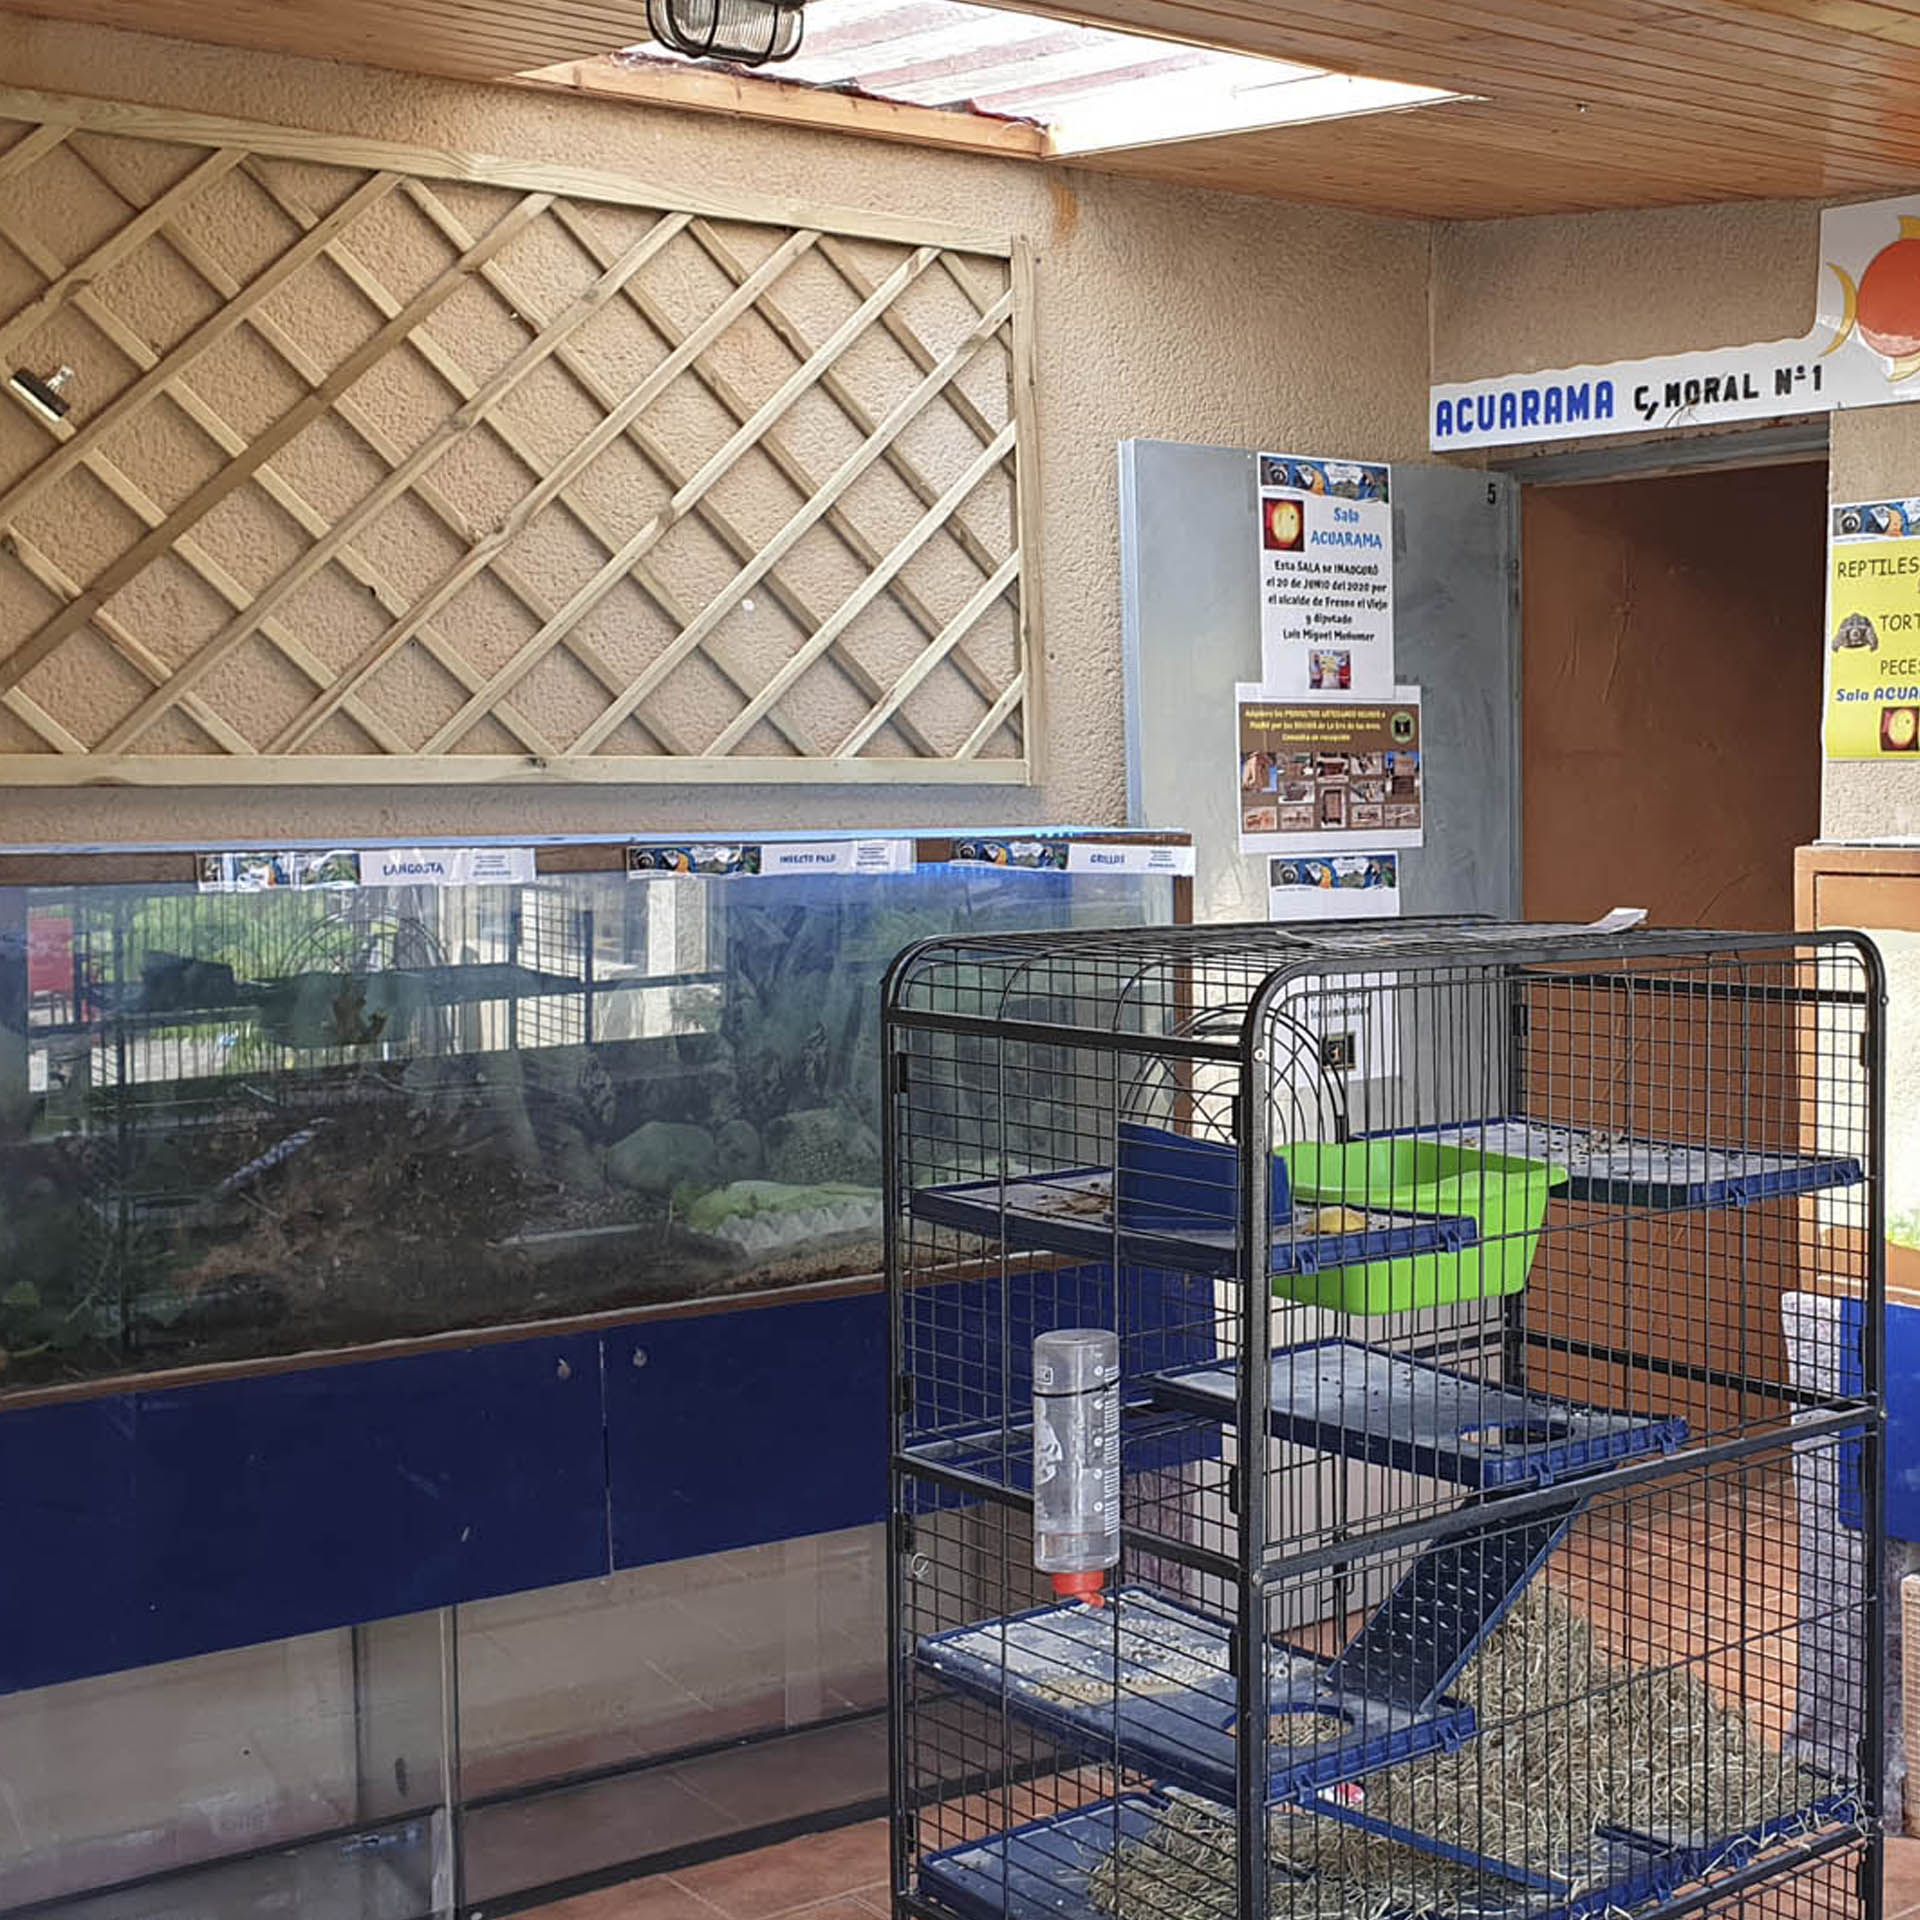 sala peces zoo, sala acuarama, la era de las aves